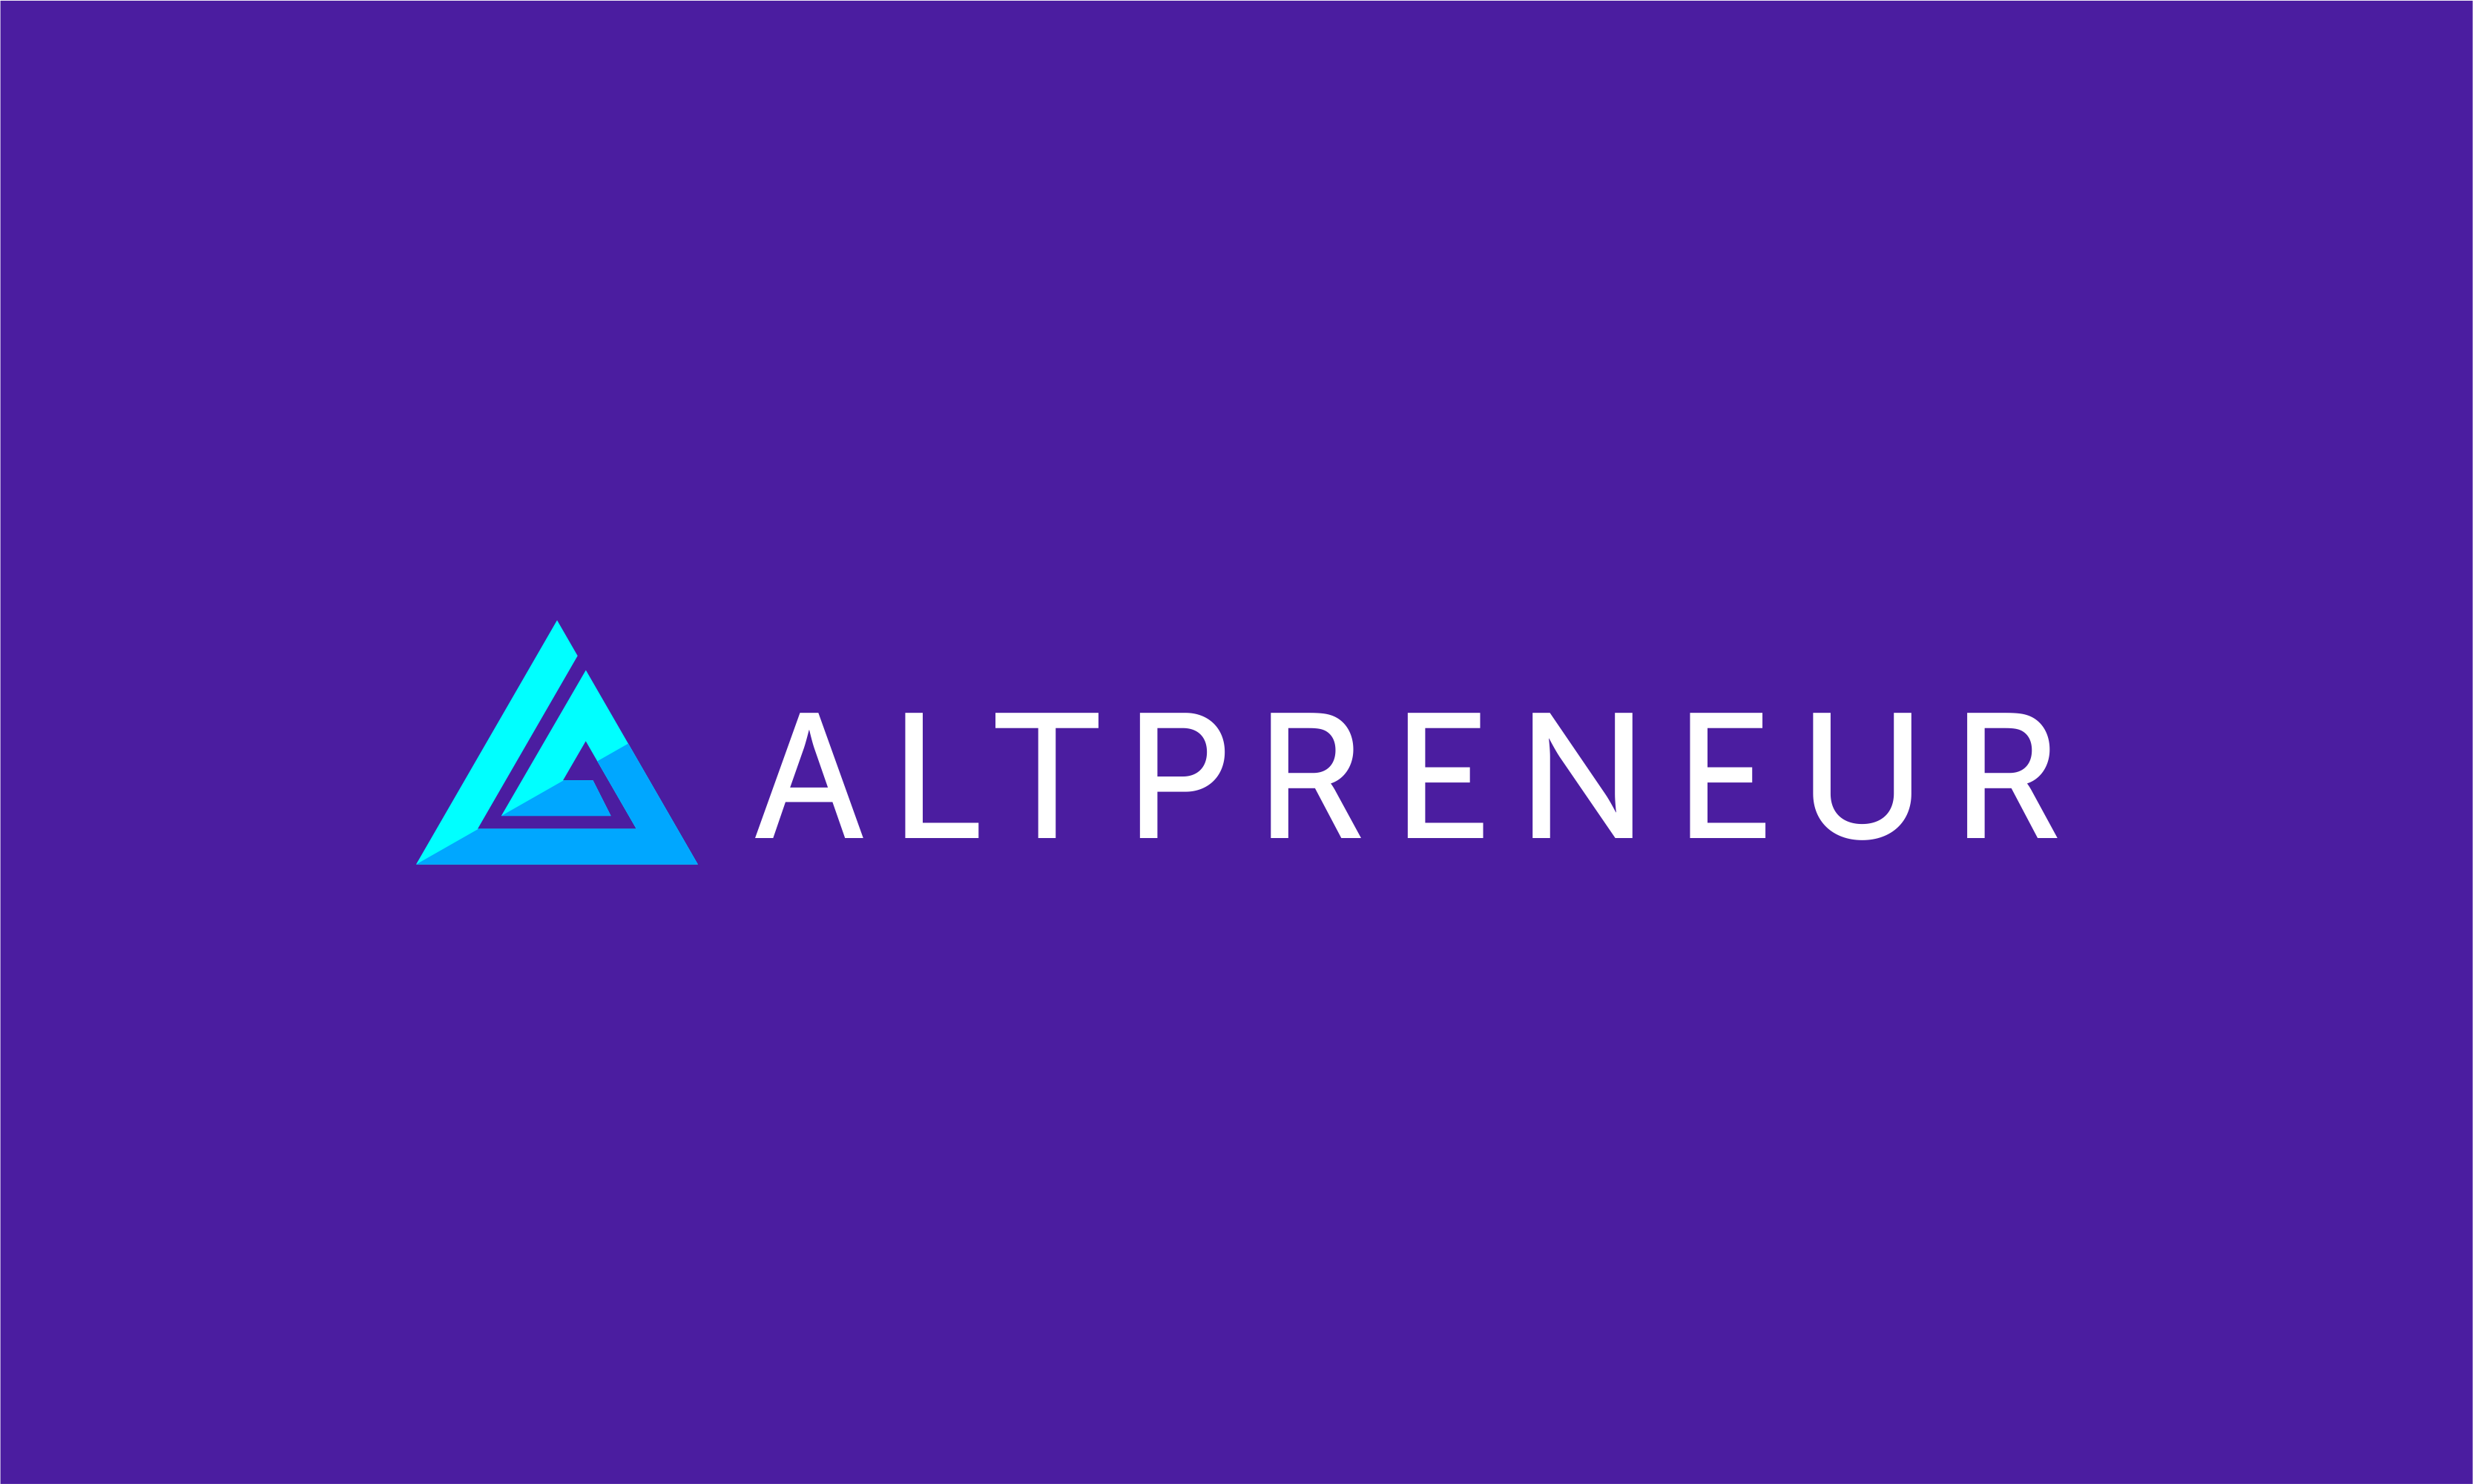 Altpreneur